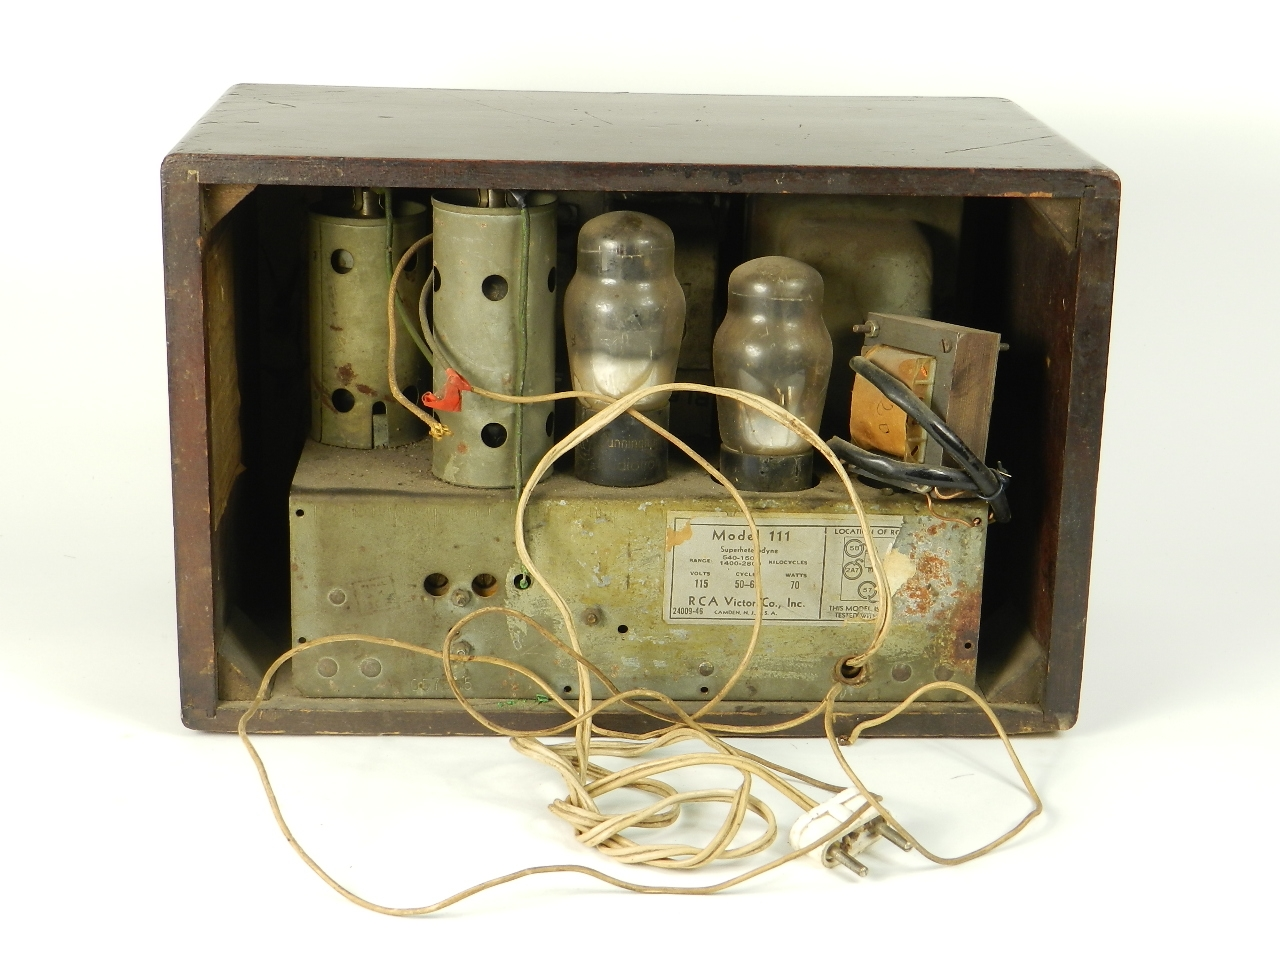 Imagen RADIO RCA VICTOR MODELO 111 29073